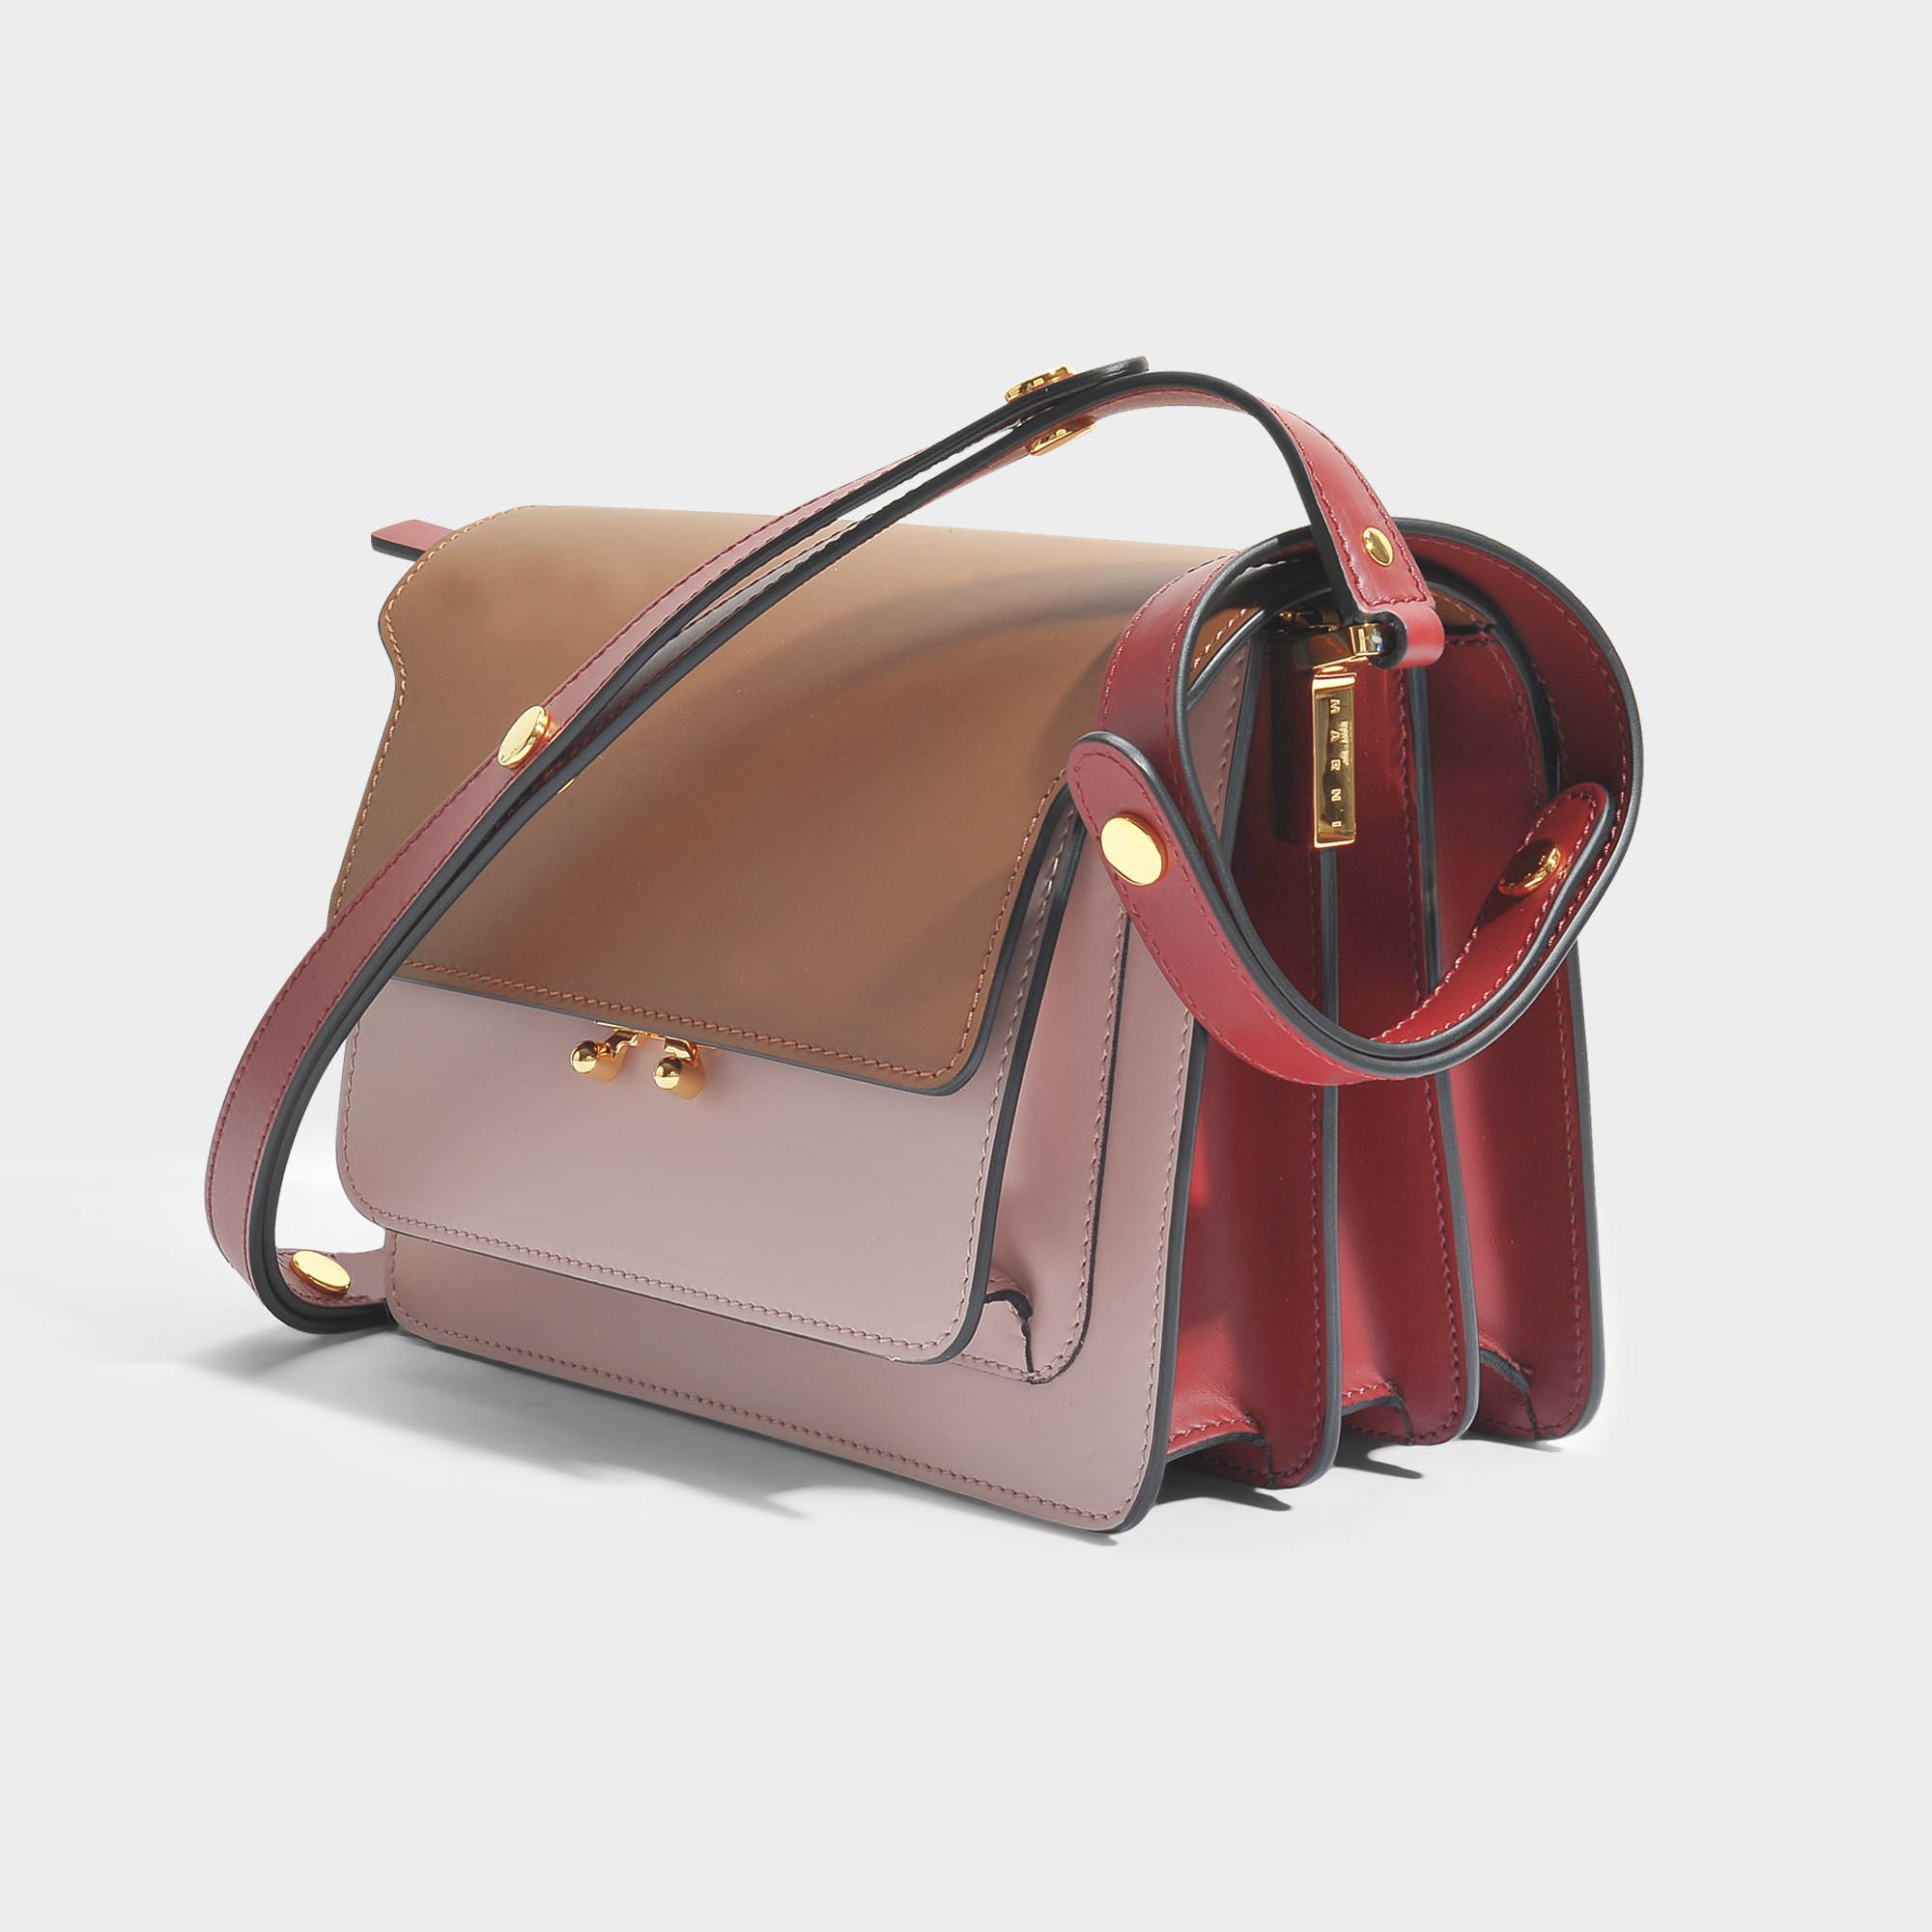 Medium Trunk shoulder bag - Brown Marni YwG4m